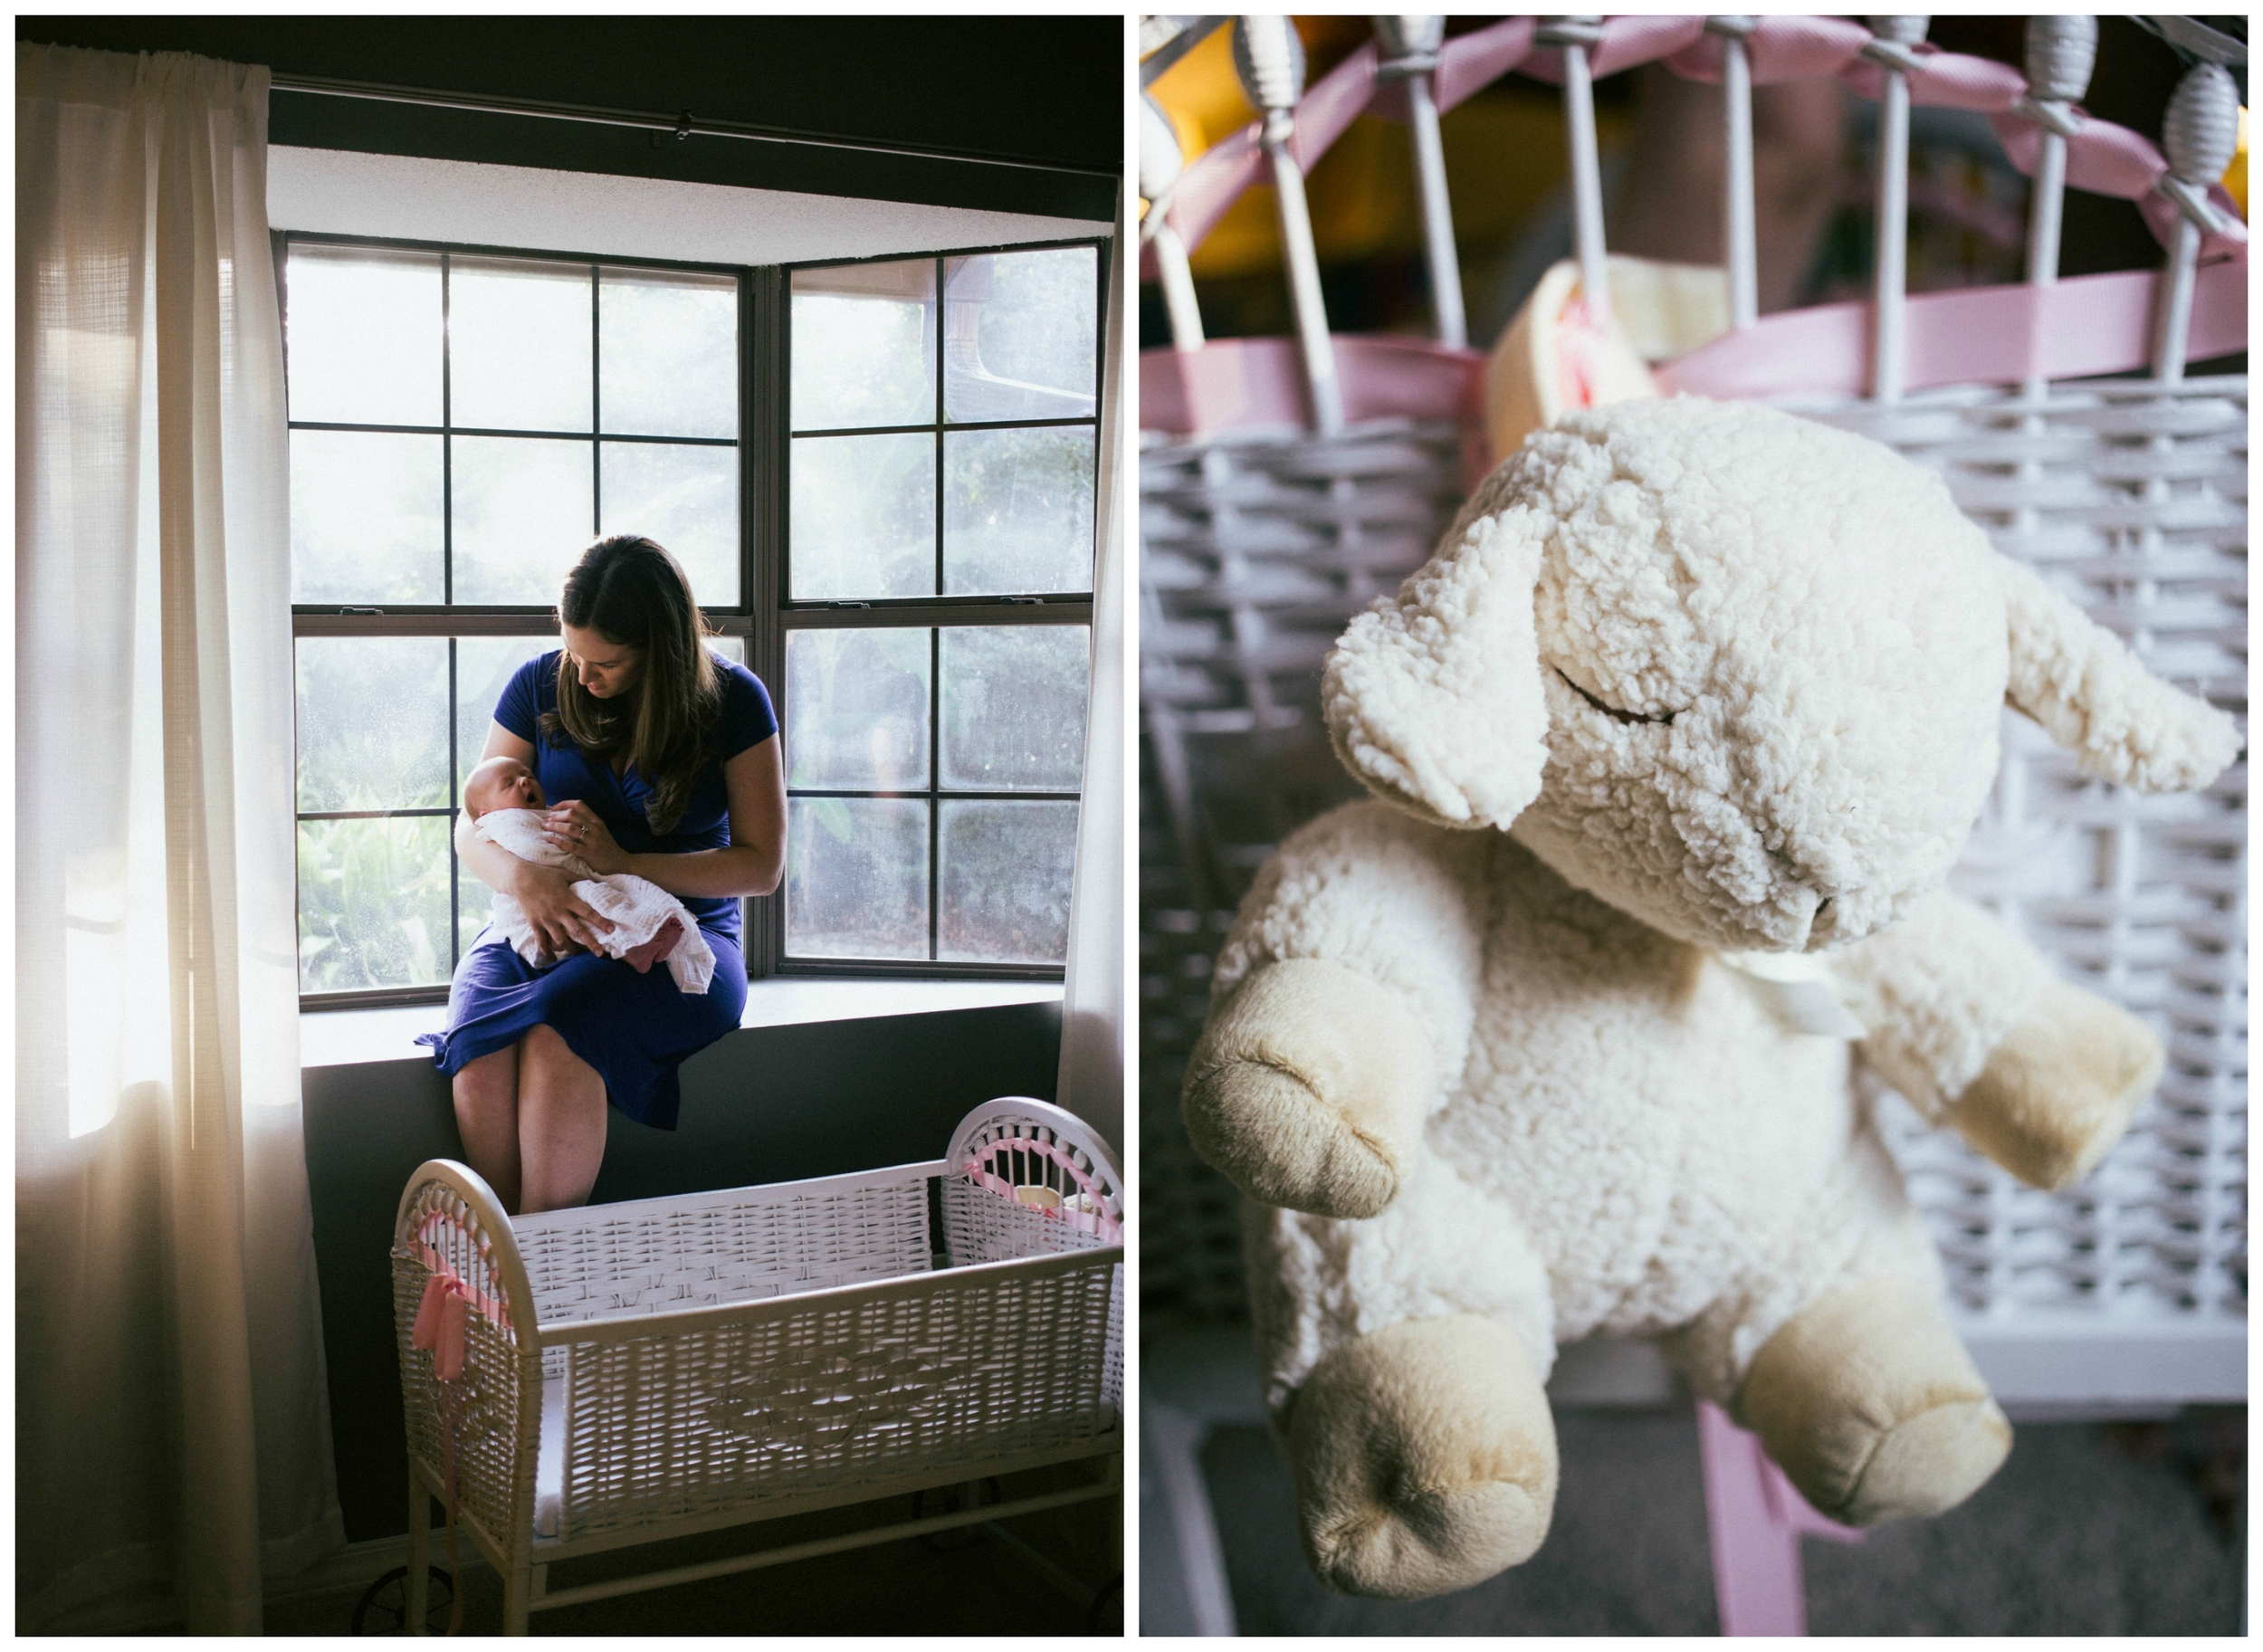 new mom with baby girl in bay window, sleep sheep on bassinet